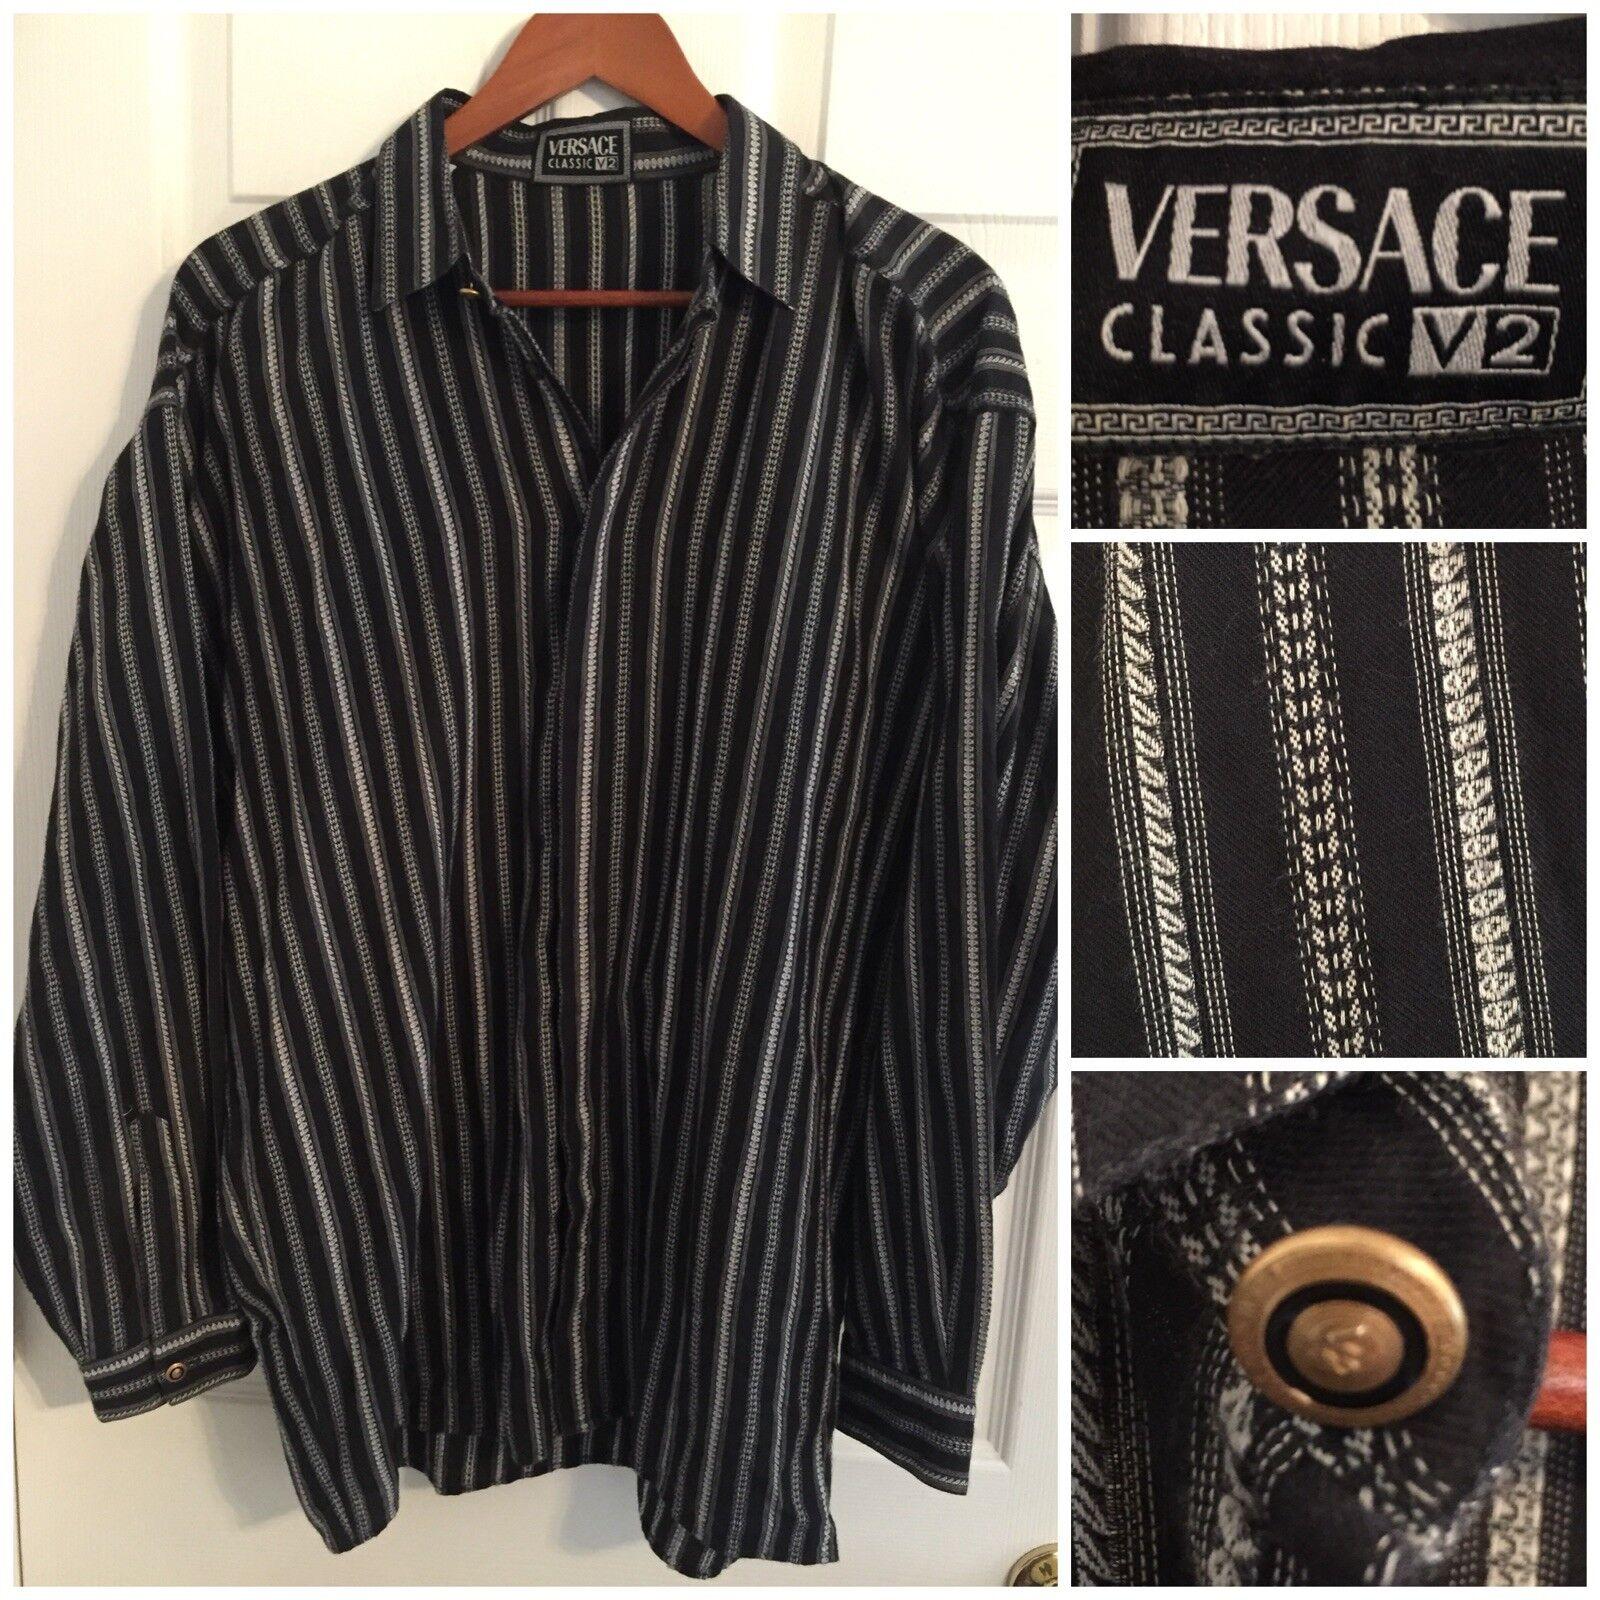 VERSACE CLASSIC V2 Black Button Front Shirt Logo Buttons MEDIUM 100% Cotton